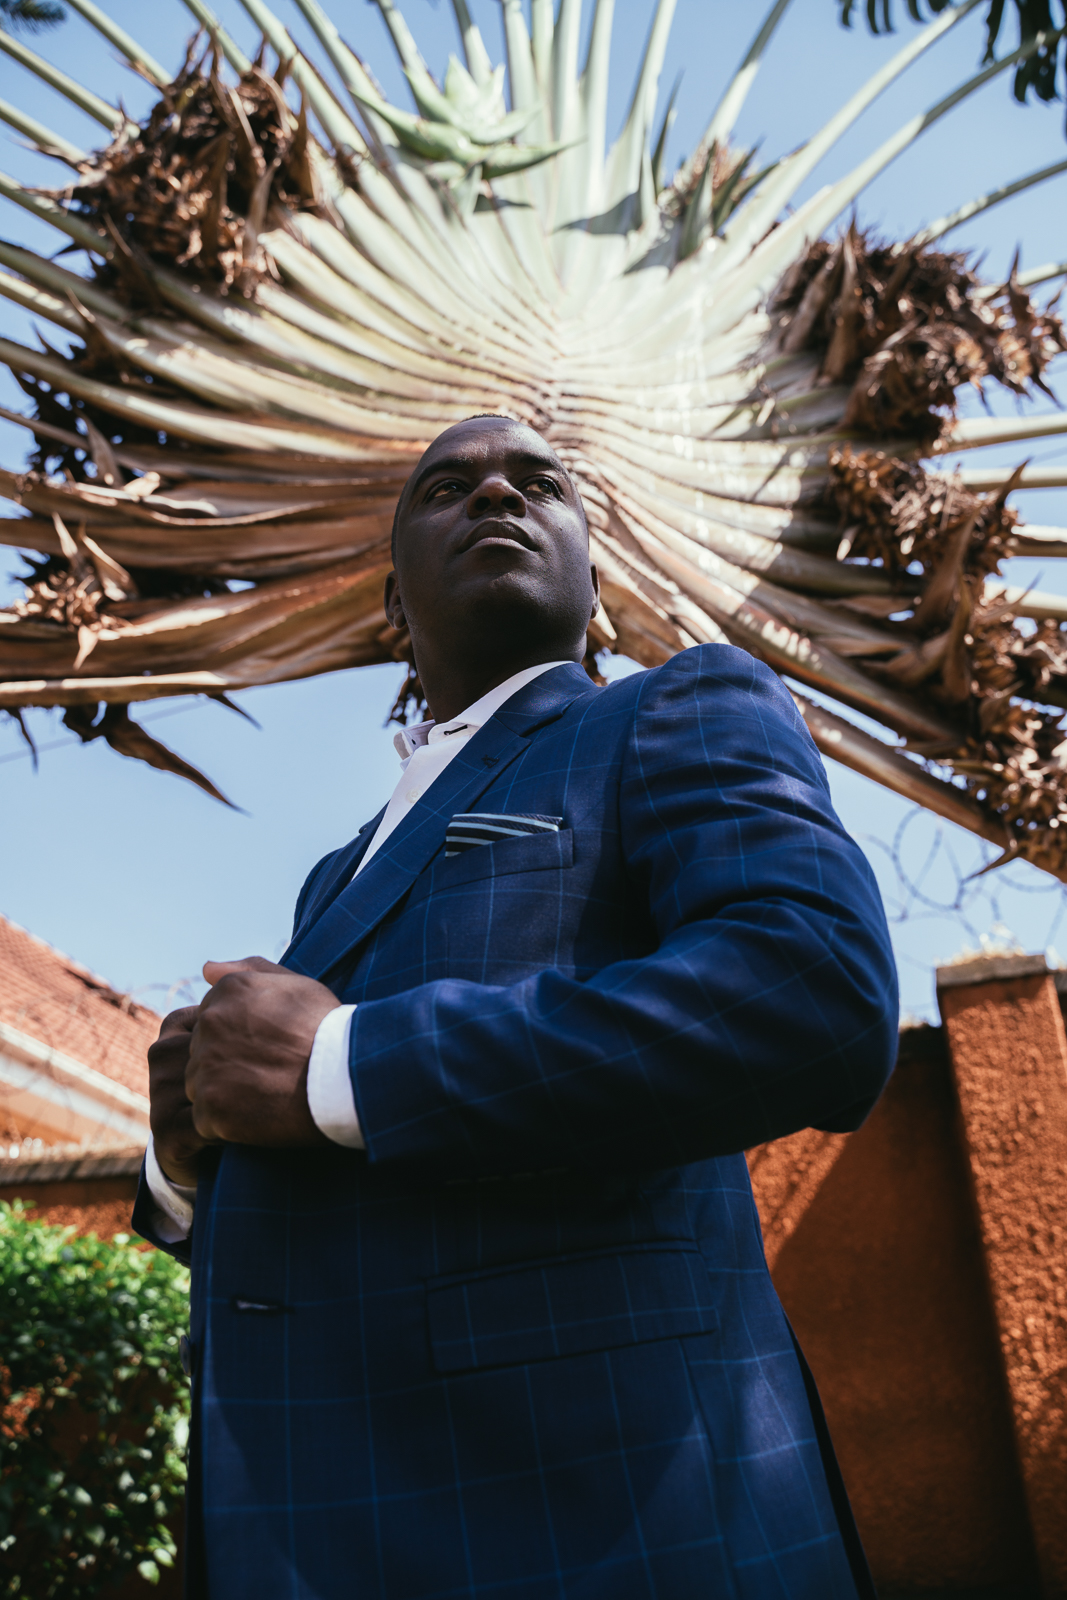 Queer_RebeccaRuetten_Uganda_Frank_web-08641.jpg